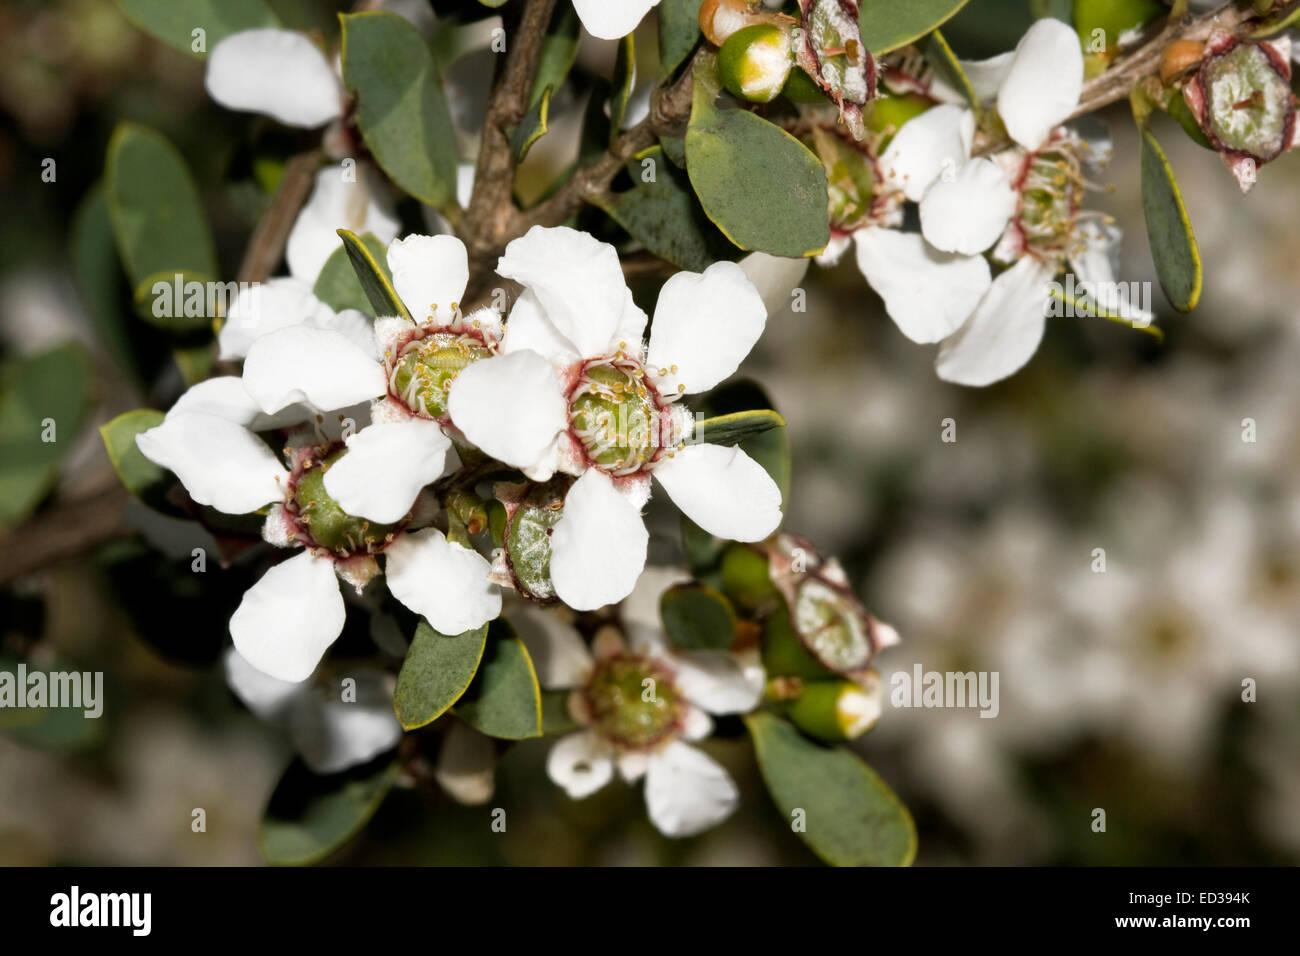 Coastal flowering plants of australia stock photos coastal cluster of attractive white australian wildflowers and dark green leaves of leptospermum laevigatum coastal tea mightylinksfo